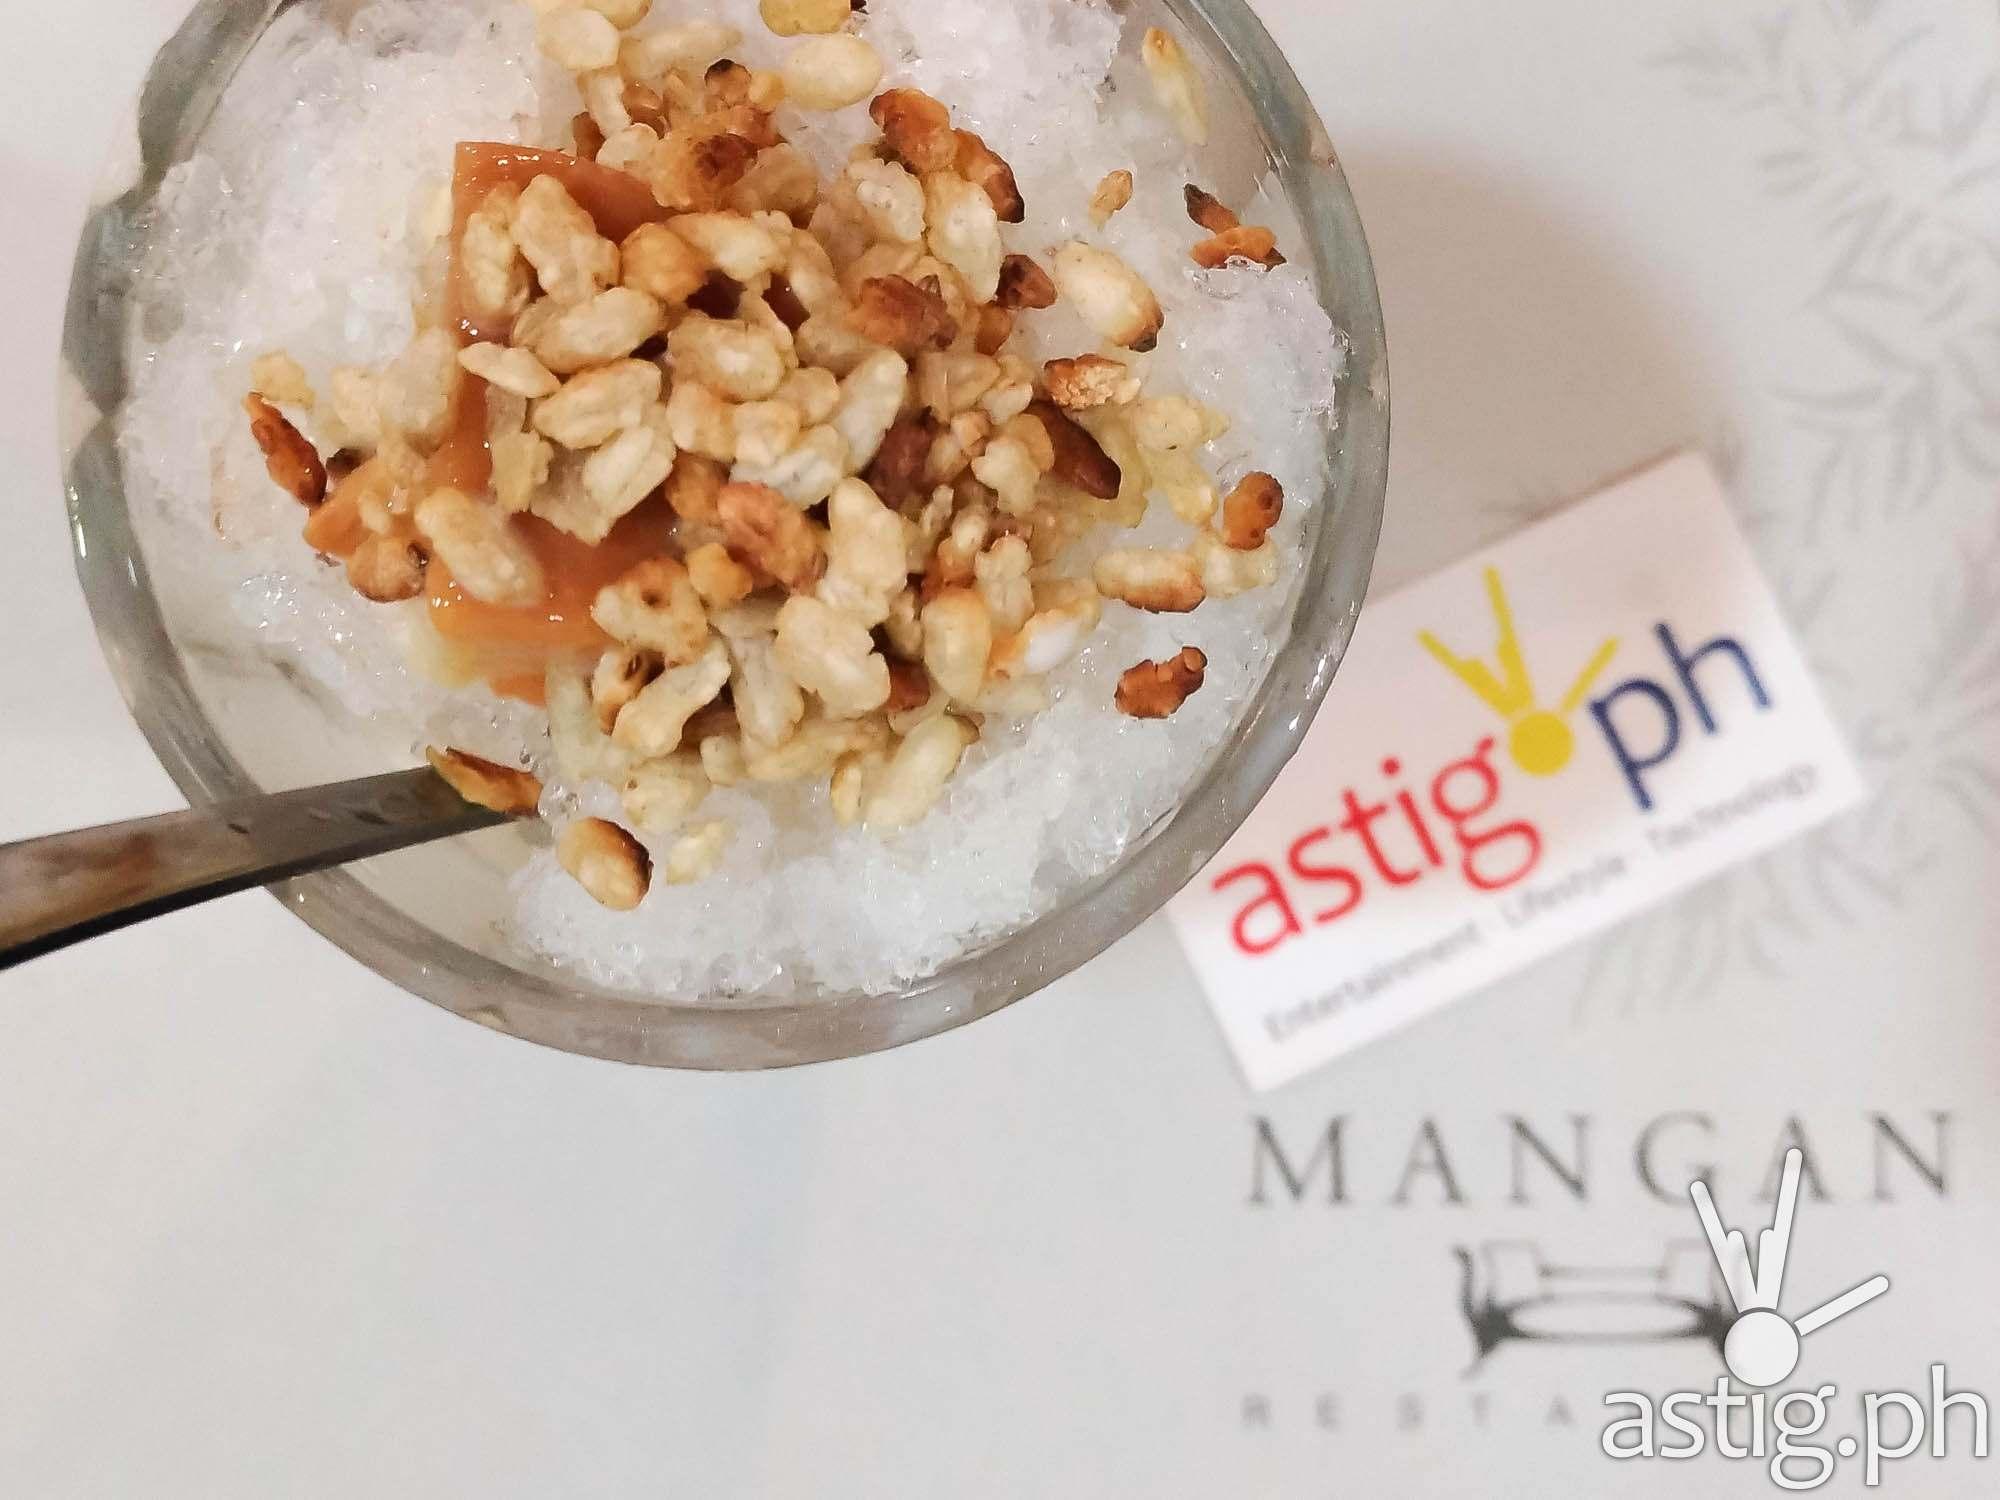 Halo-Halo Special - Mangan Restaurant Glorietta 2